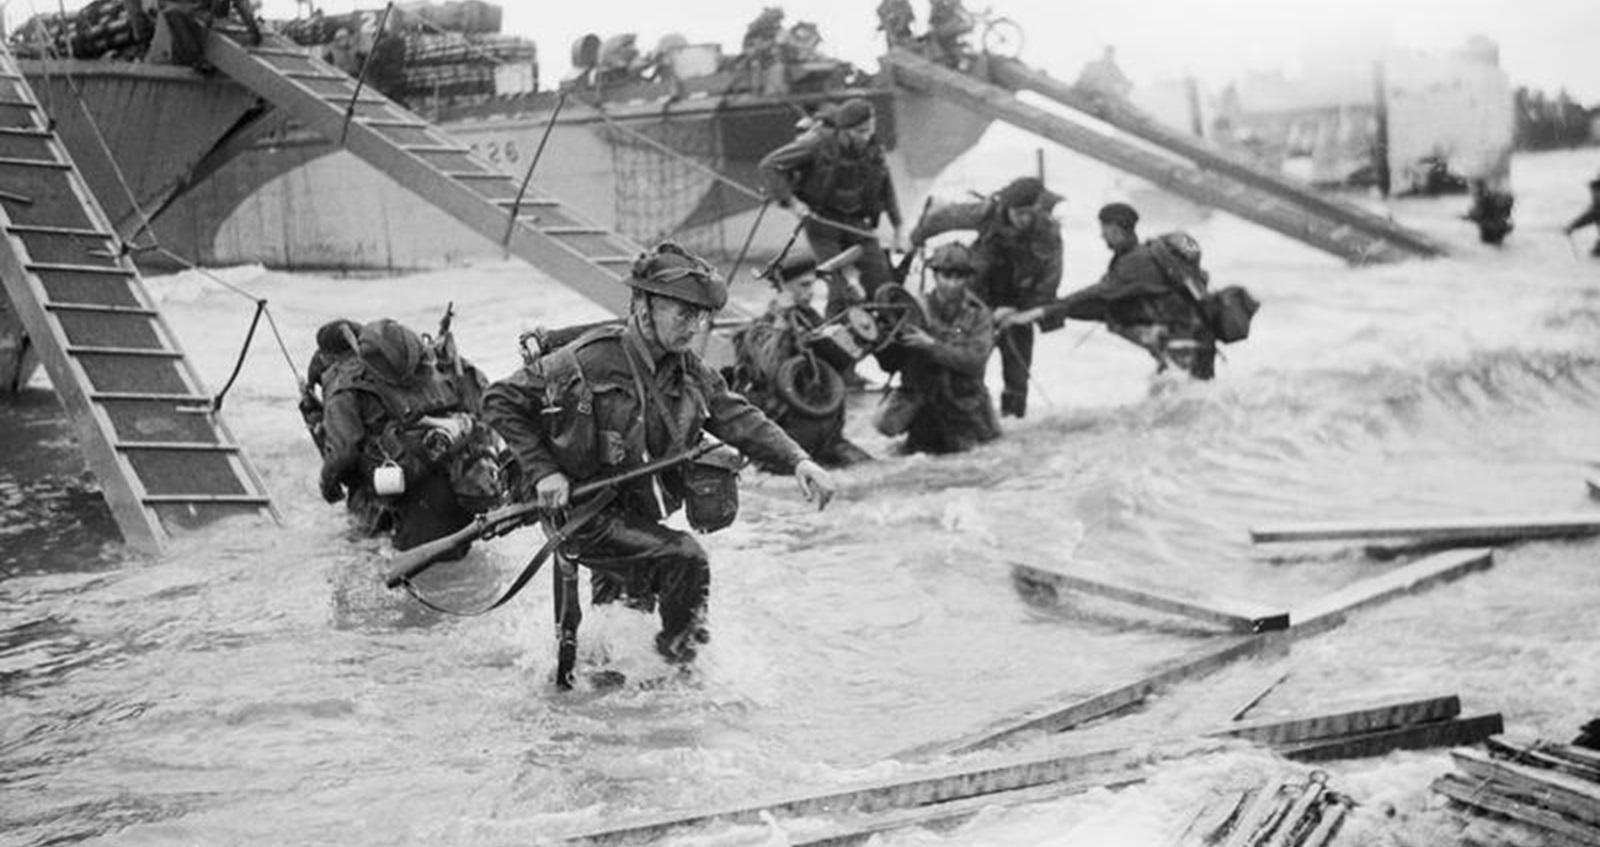 Royal Marine Commandos making their way onto the 'Nan Red' sector of Juno Beach, 6 June 1944.